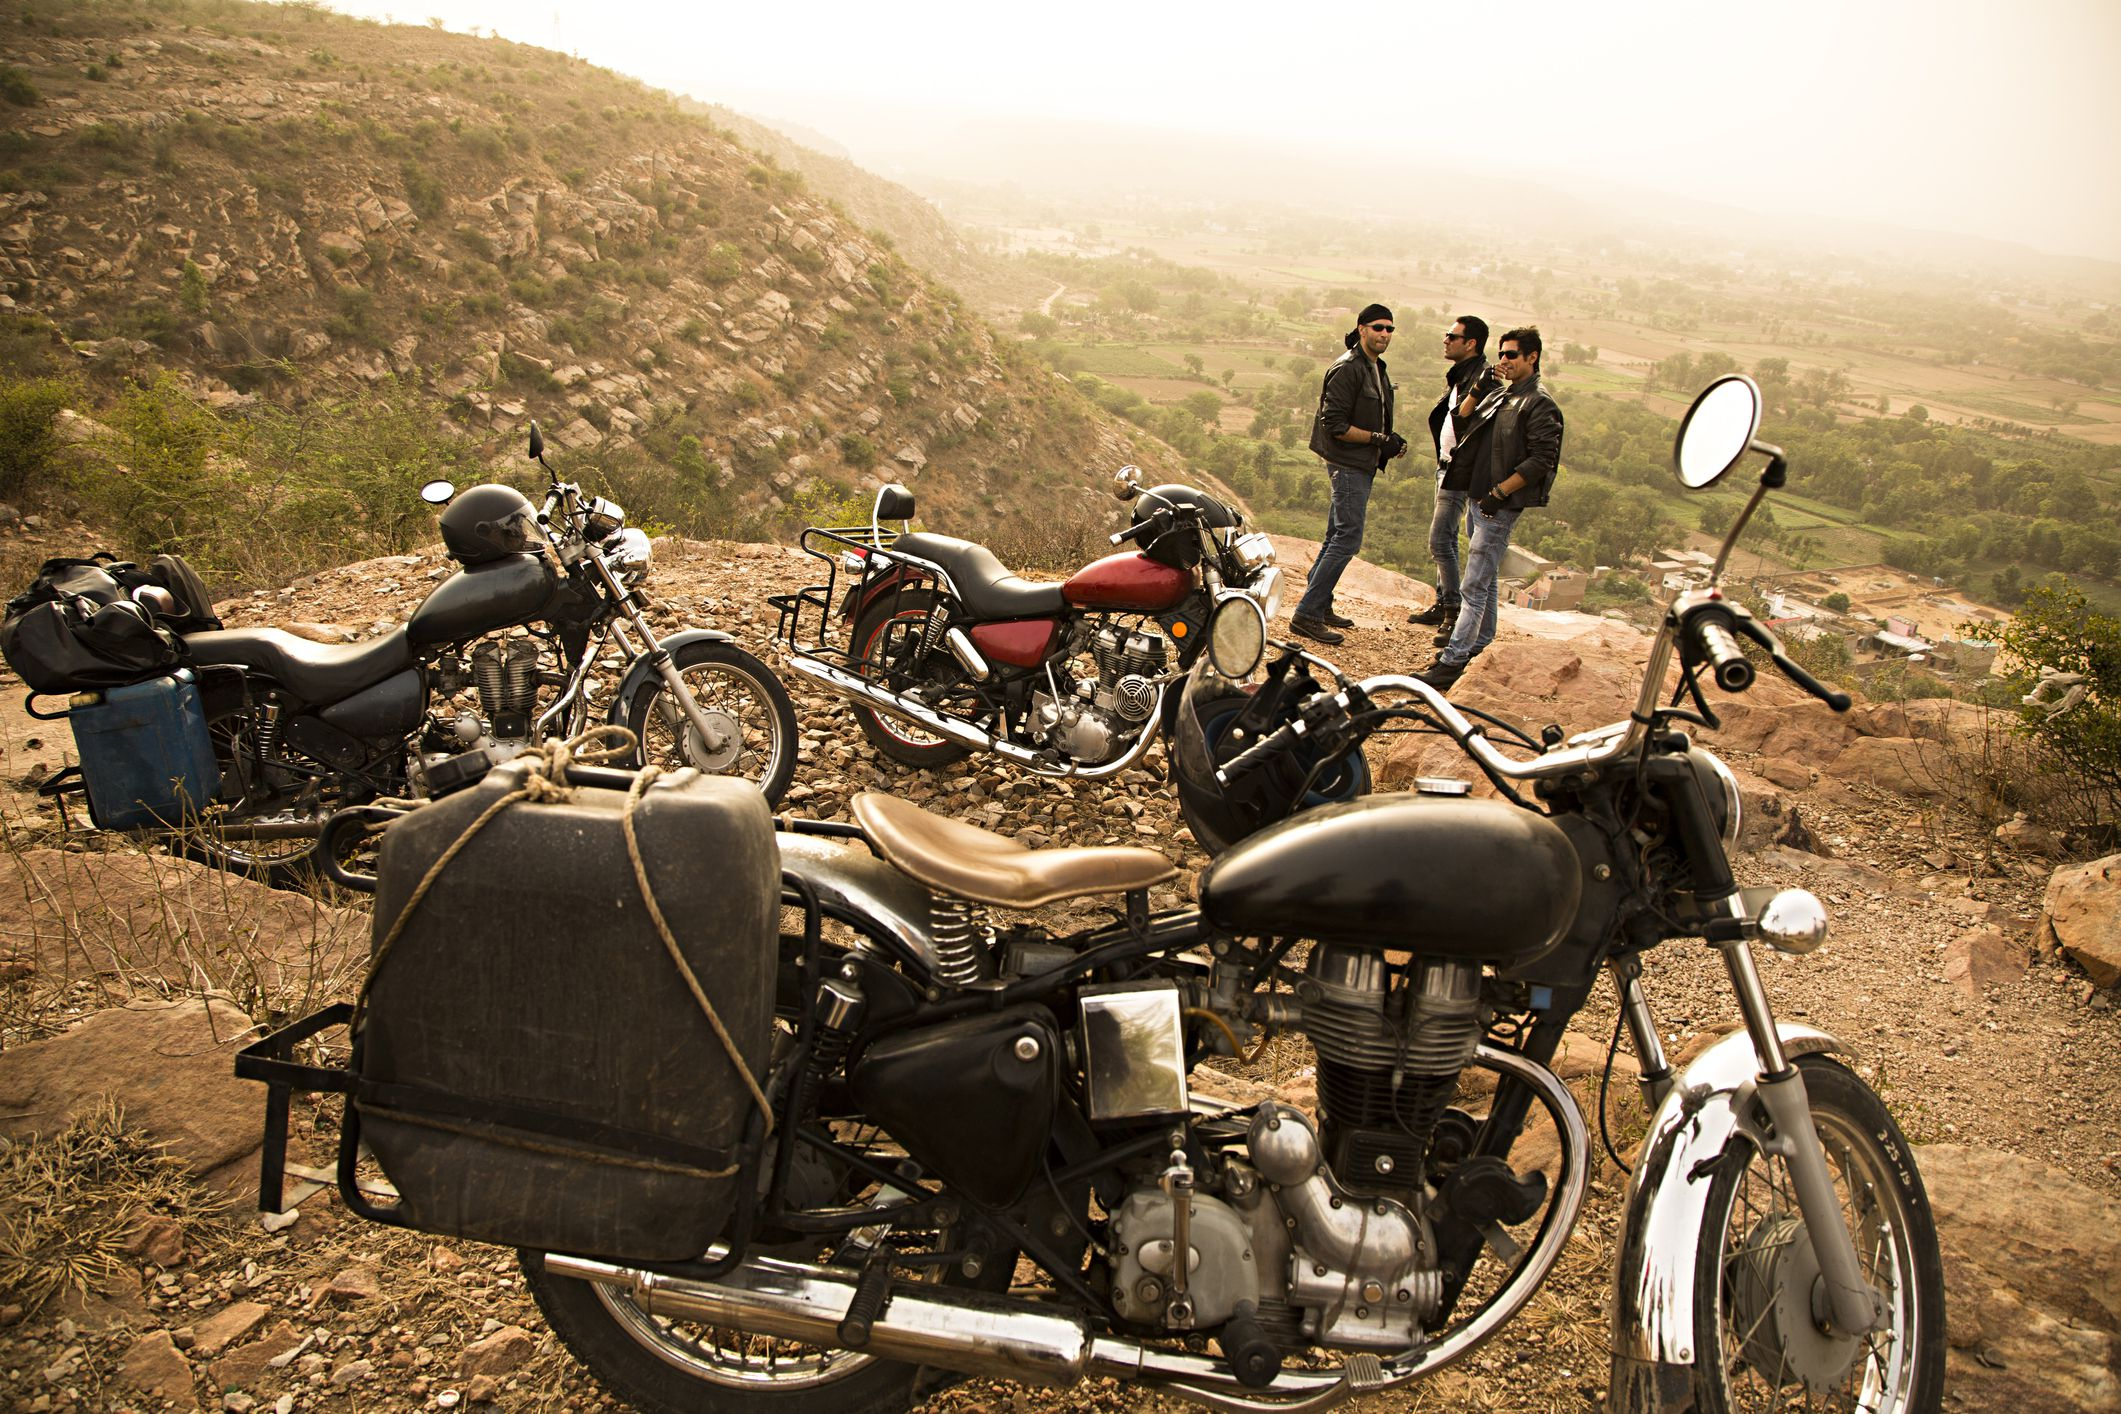 Motorcycle Tours Asia